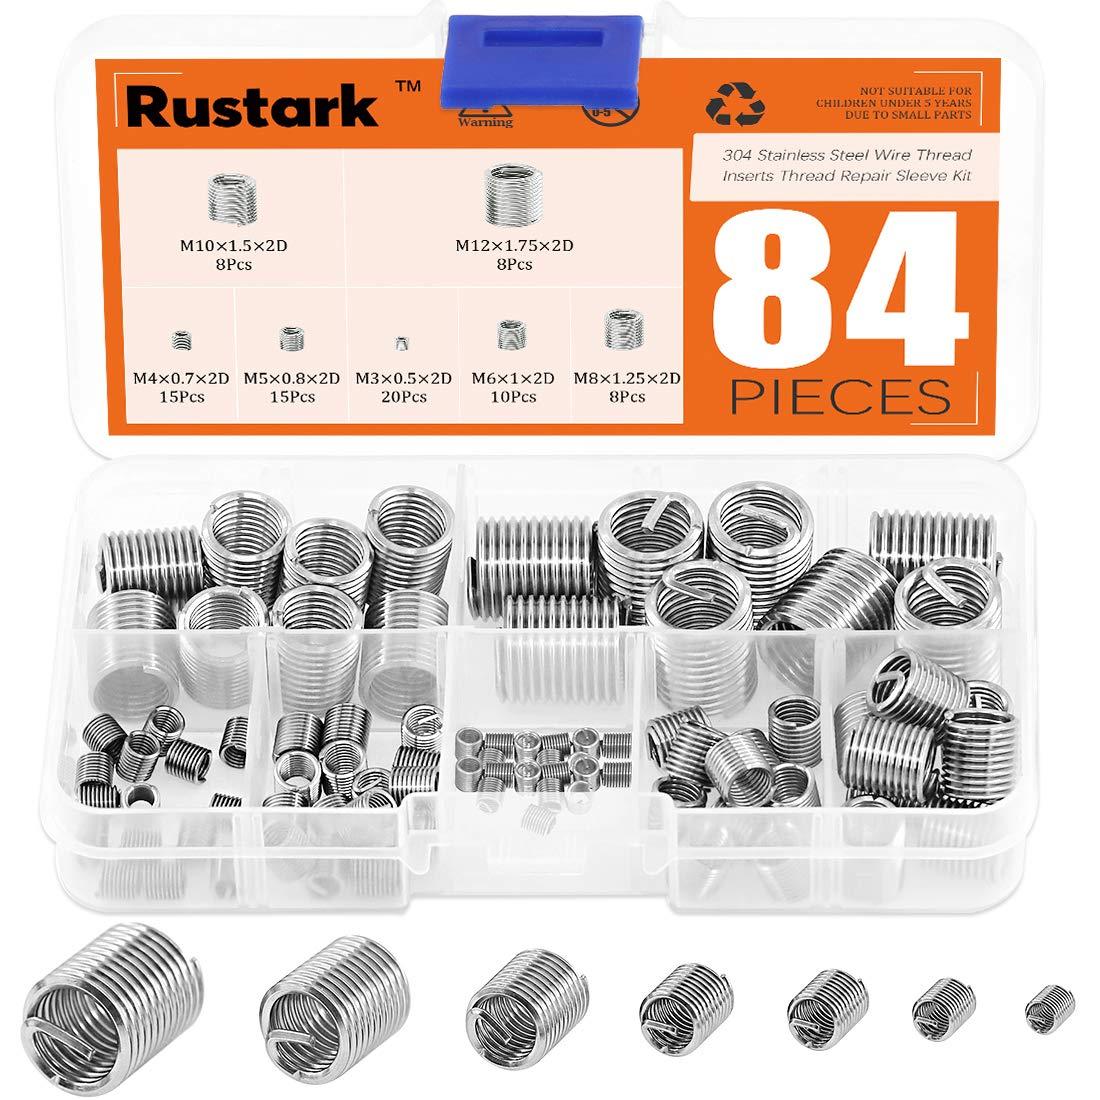 Rustark 84 Pcs 304 Stainless Steel Metric M3 M4 M5 M6 M8 M10 M12 Wire Thread Inserts Steel Sheath Helicoil Type Screw Repair Sleeve Assortment Kit